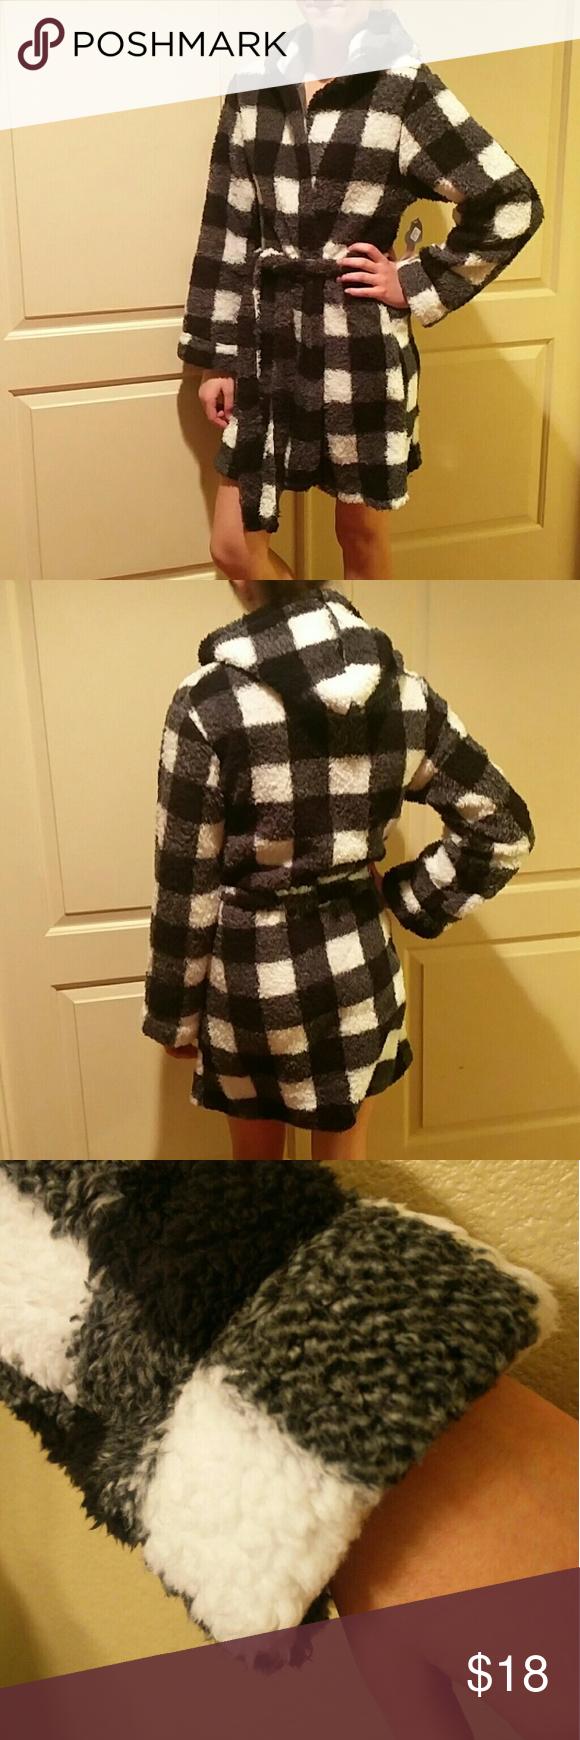 Selling this Robe on Poshmark! My username is: dstelmakh233. #shopmycloset #poshmark #fashion #shopping #style #forsale #Other